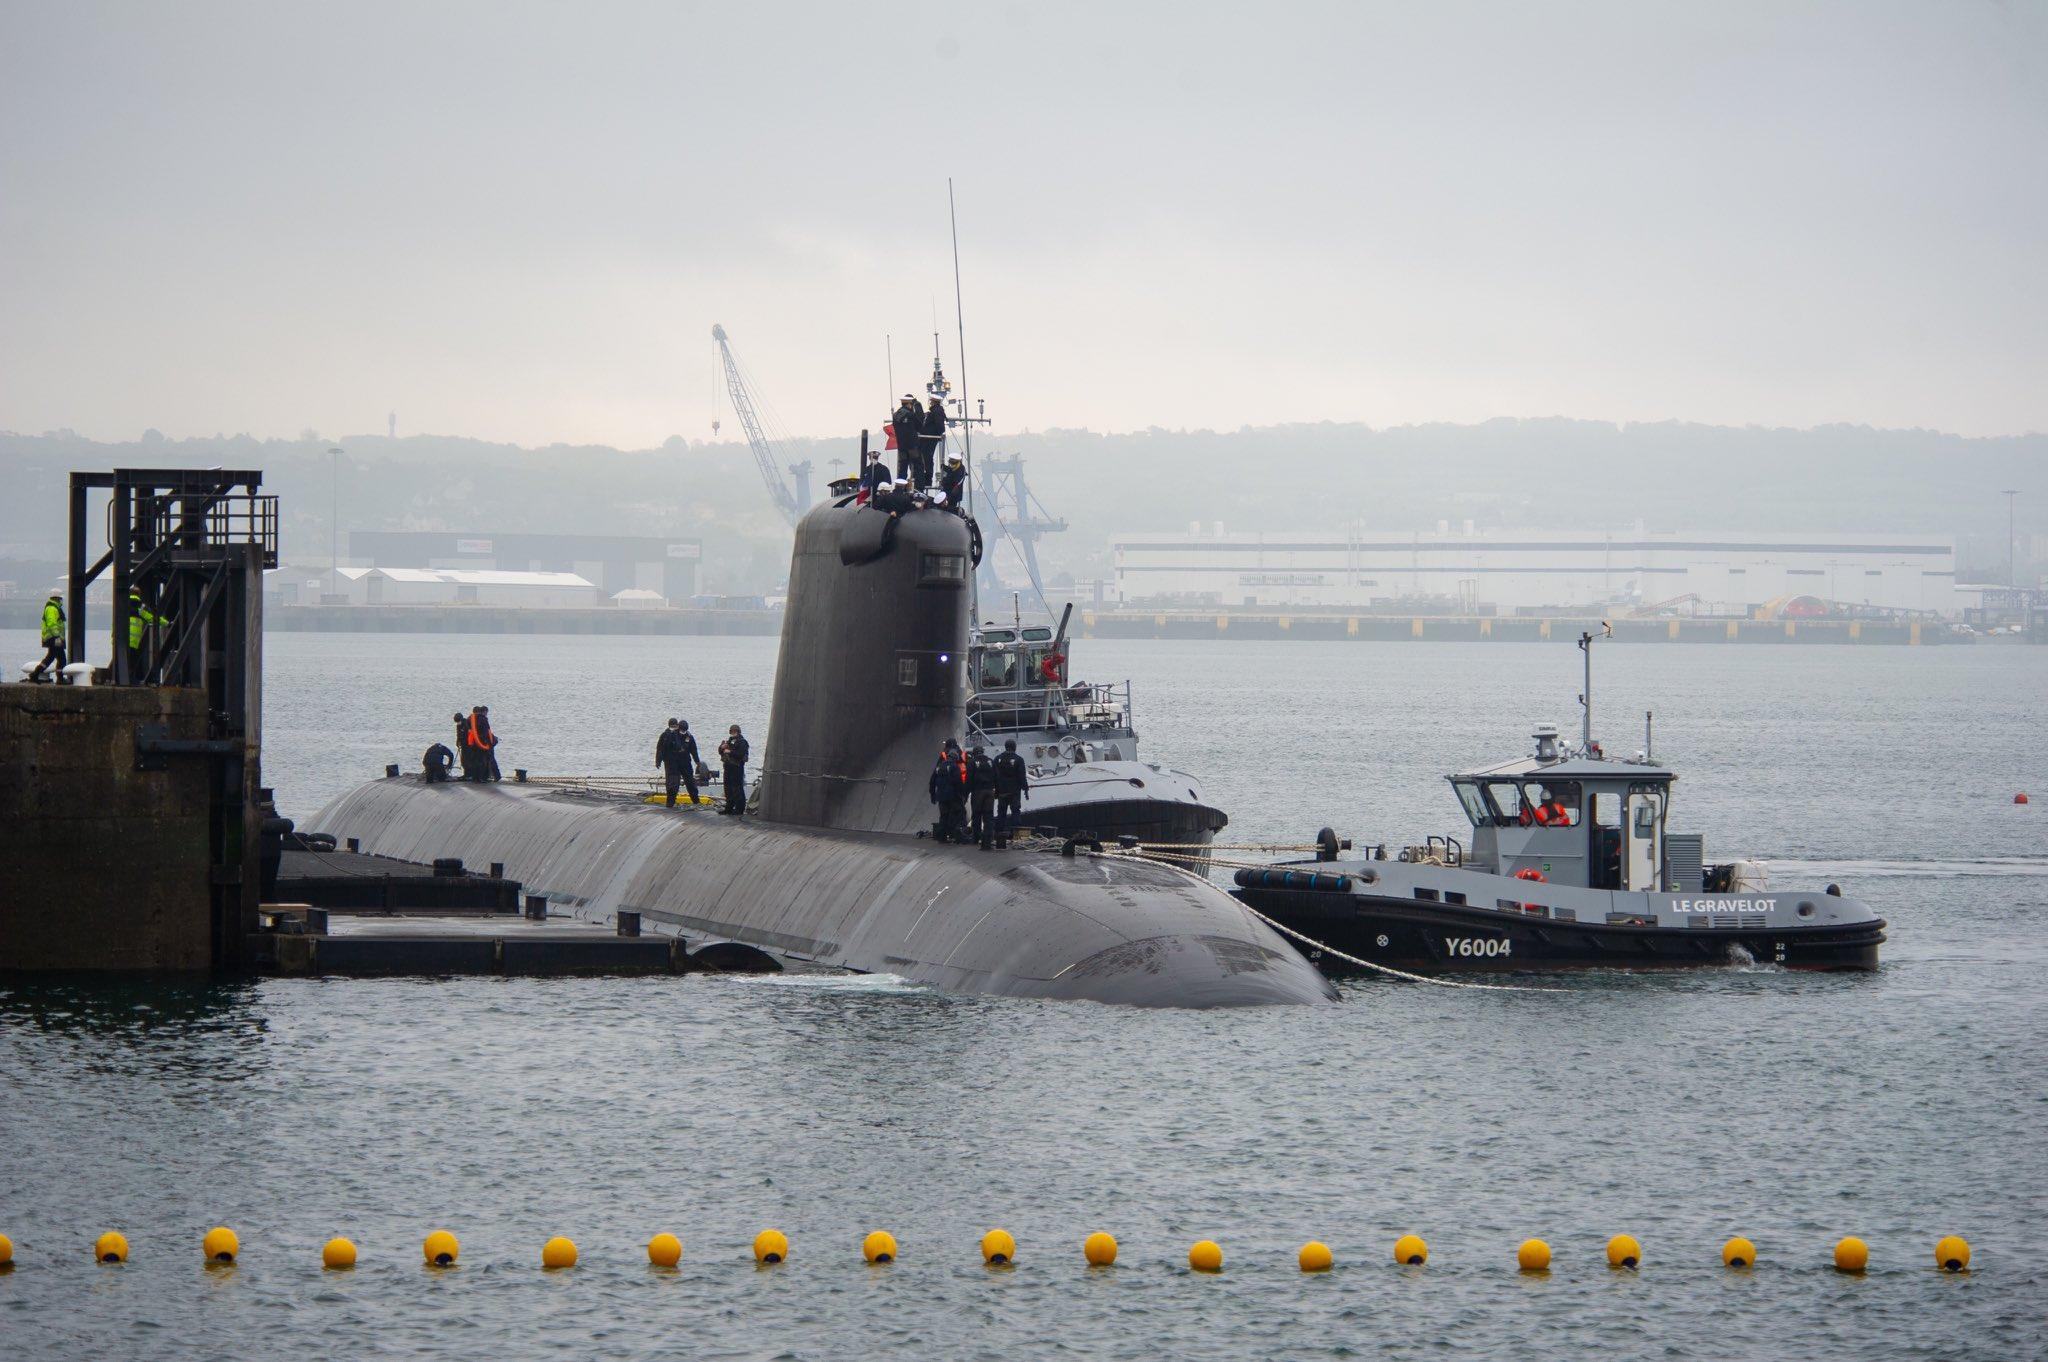 ewzxmucxqaahc4z - naval post- naval news and information